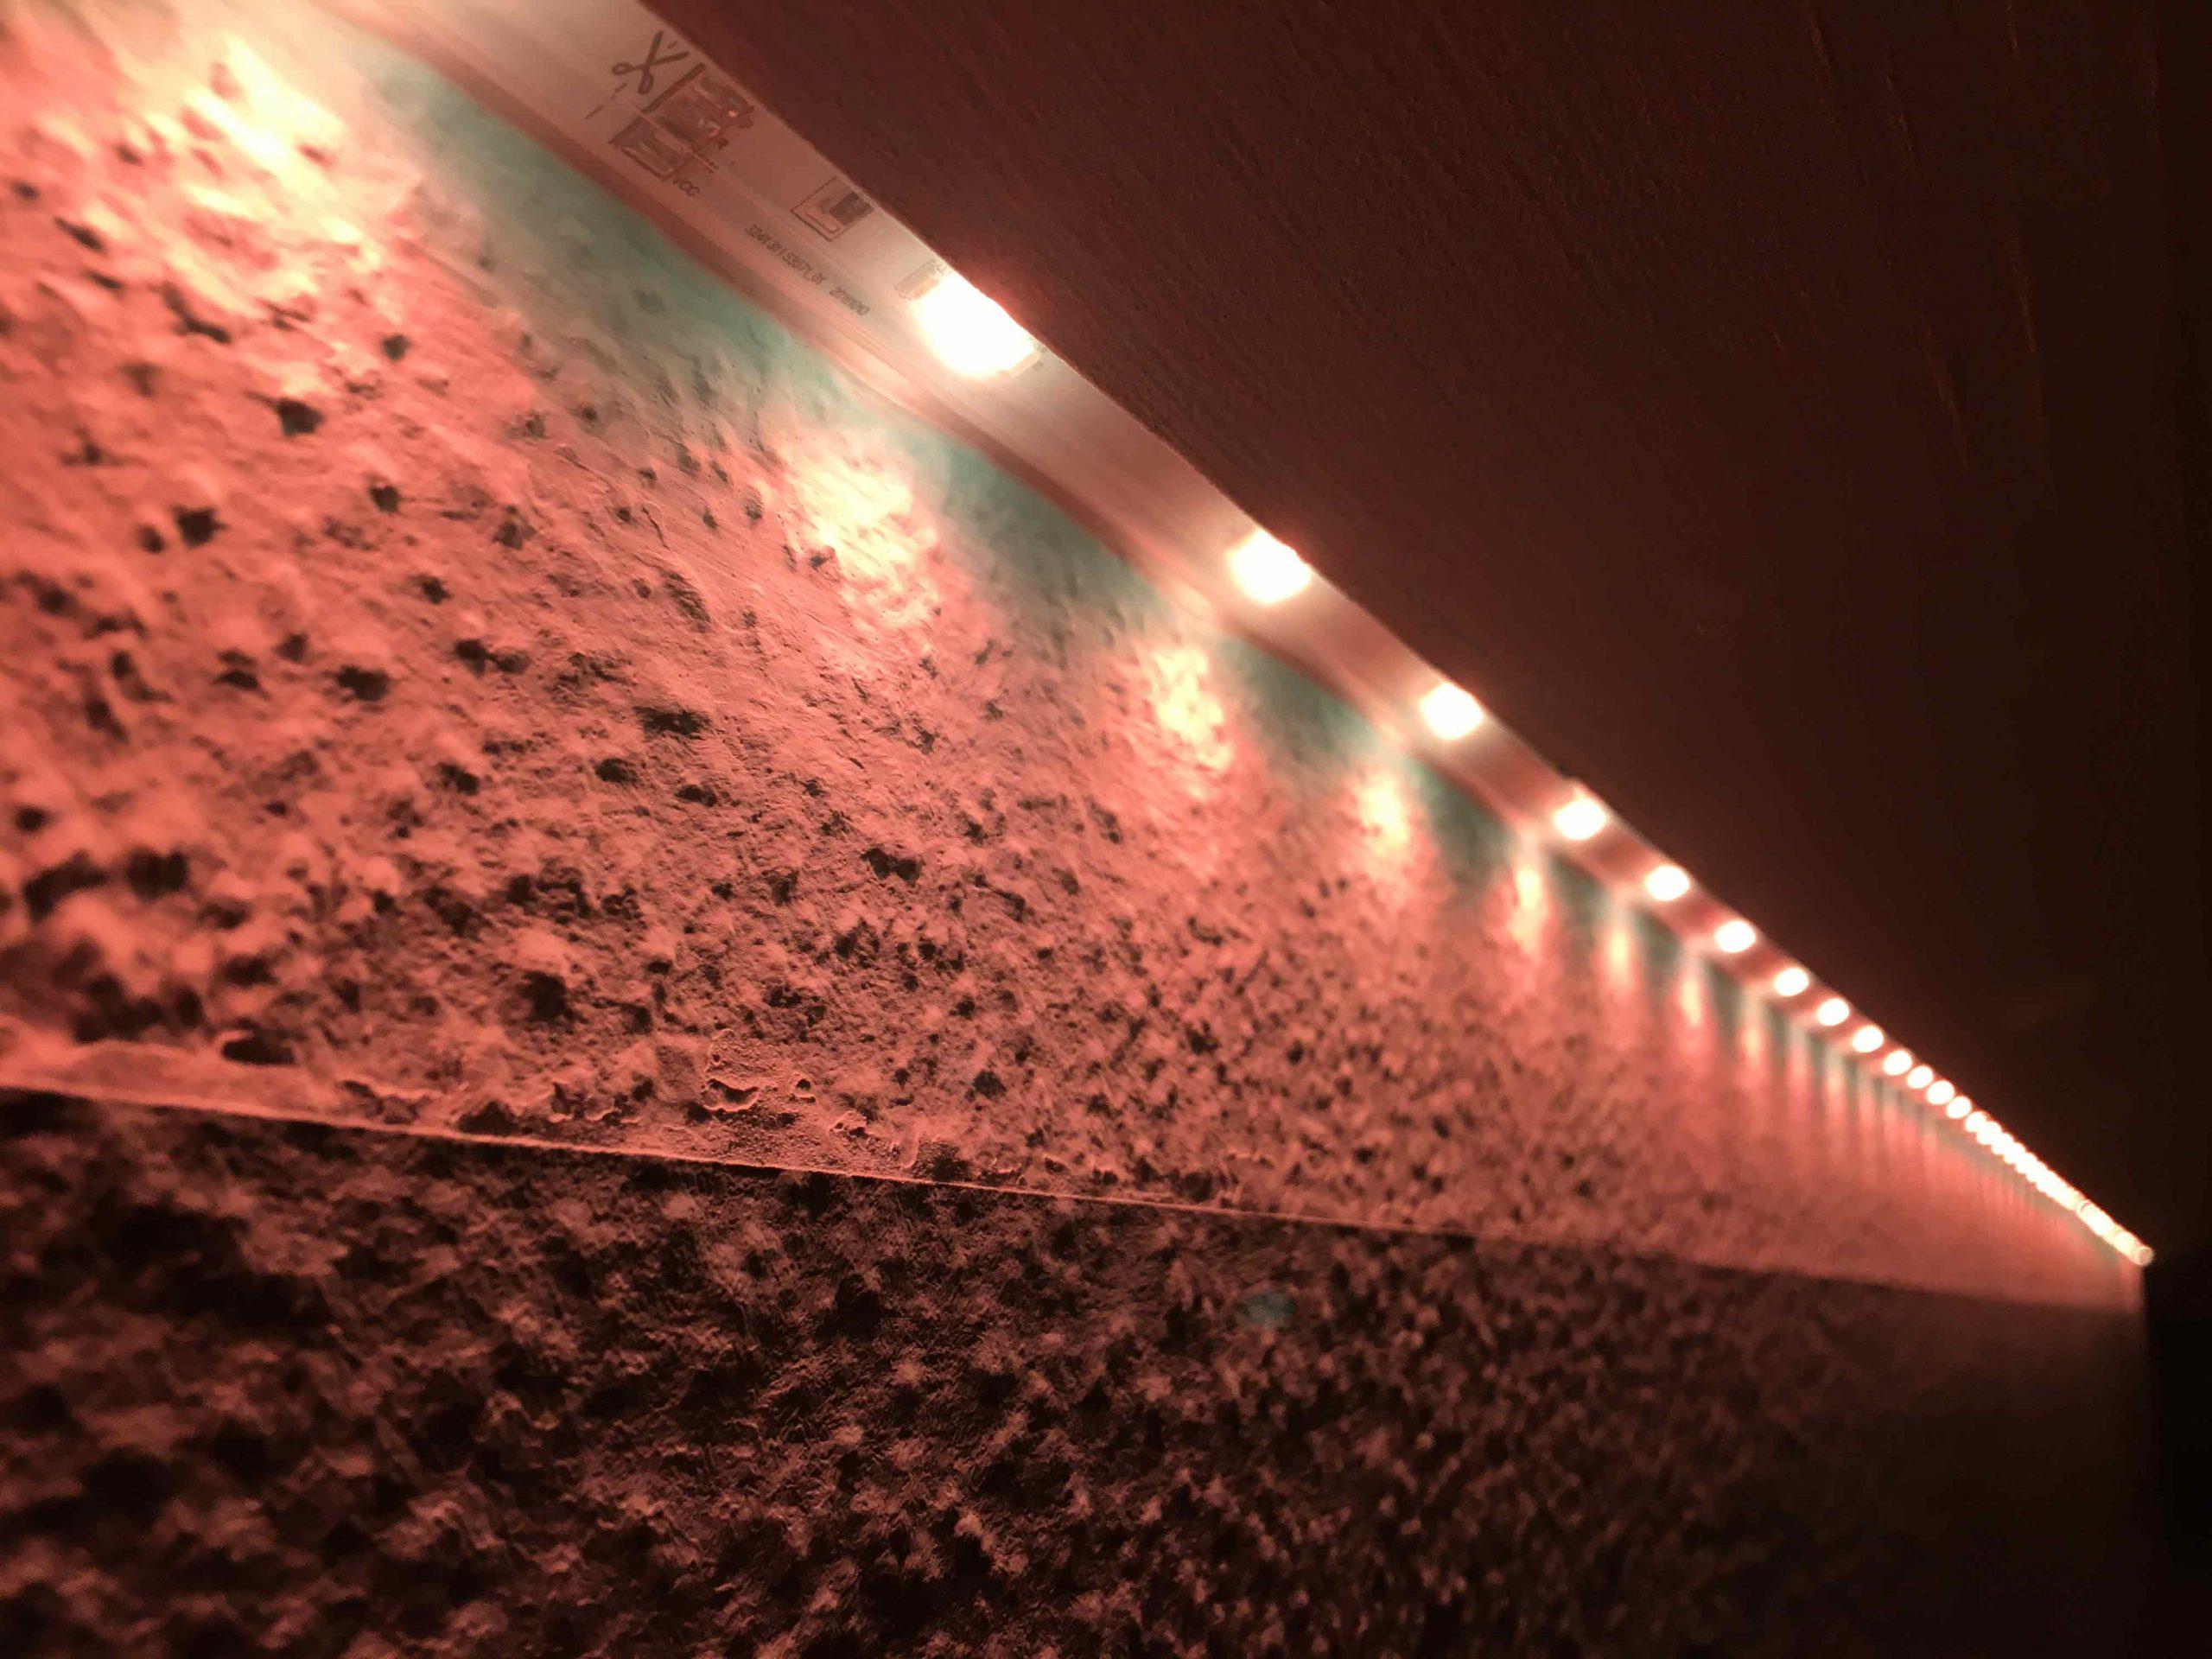 Philips Hue Leuchten Lampen Zubehor Hobbyblogging